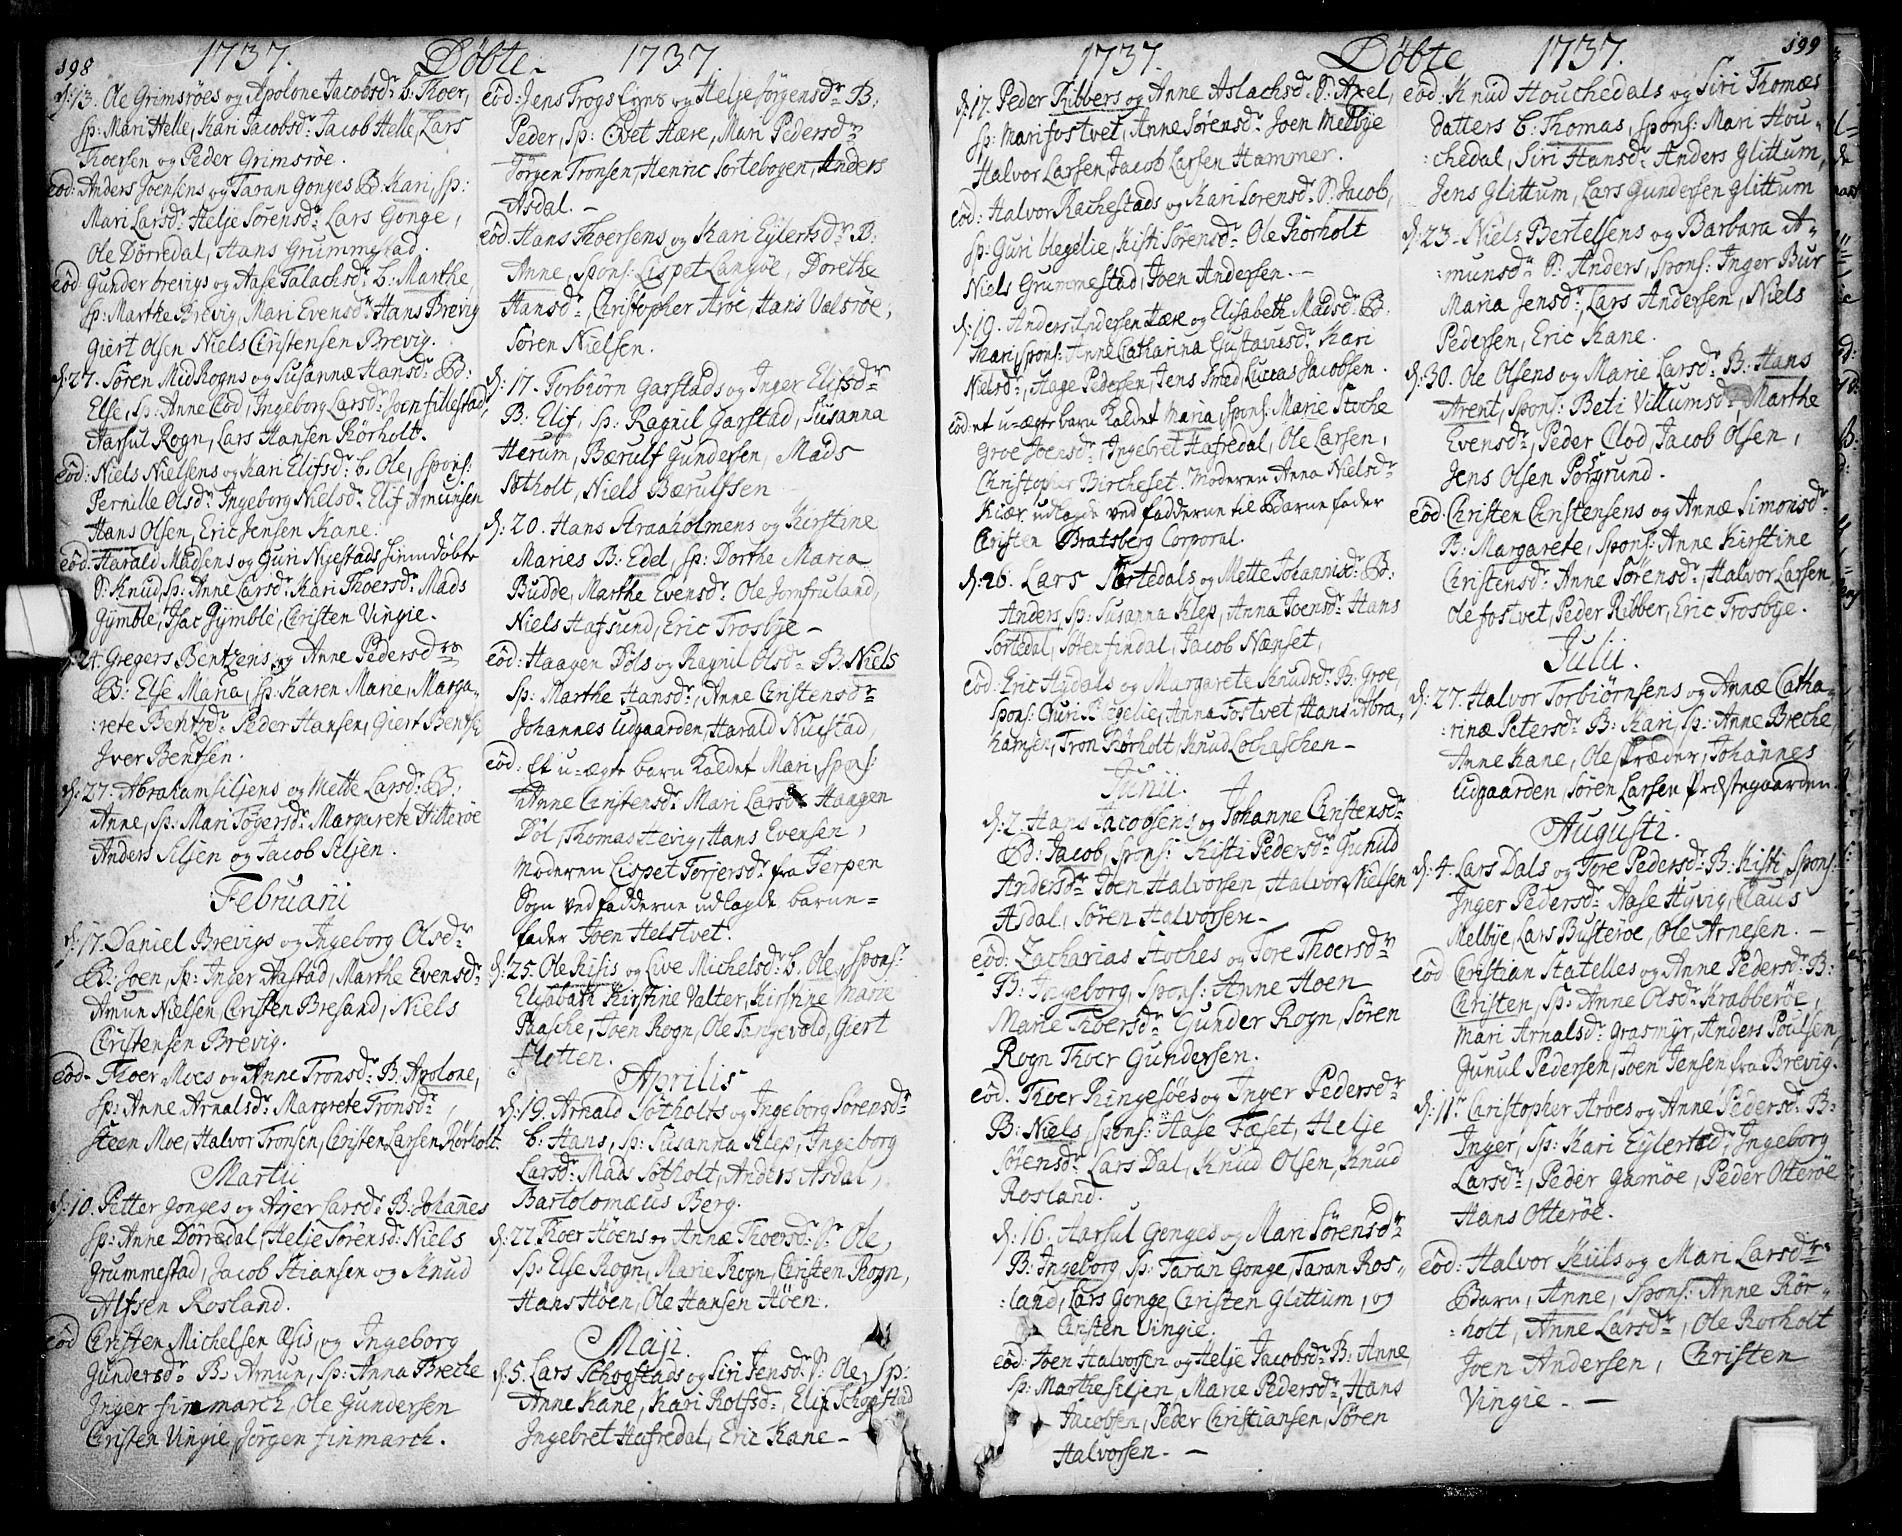 SAKO, Bamble kirkebøker, F/Fa/L0001: Ministerialbok nr. I 1, 1702-1774, s. 198-199